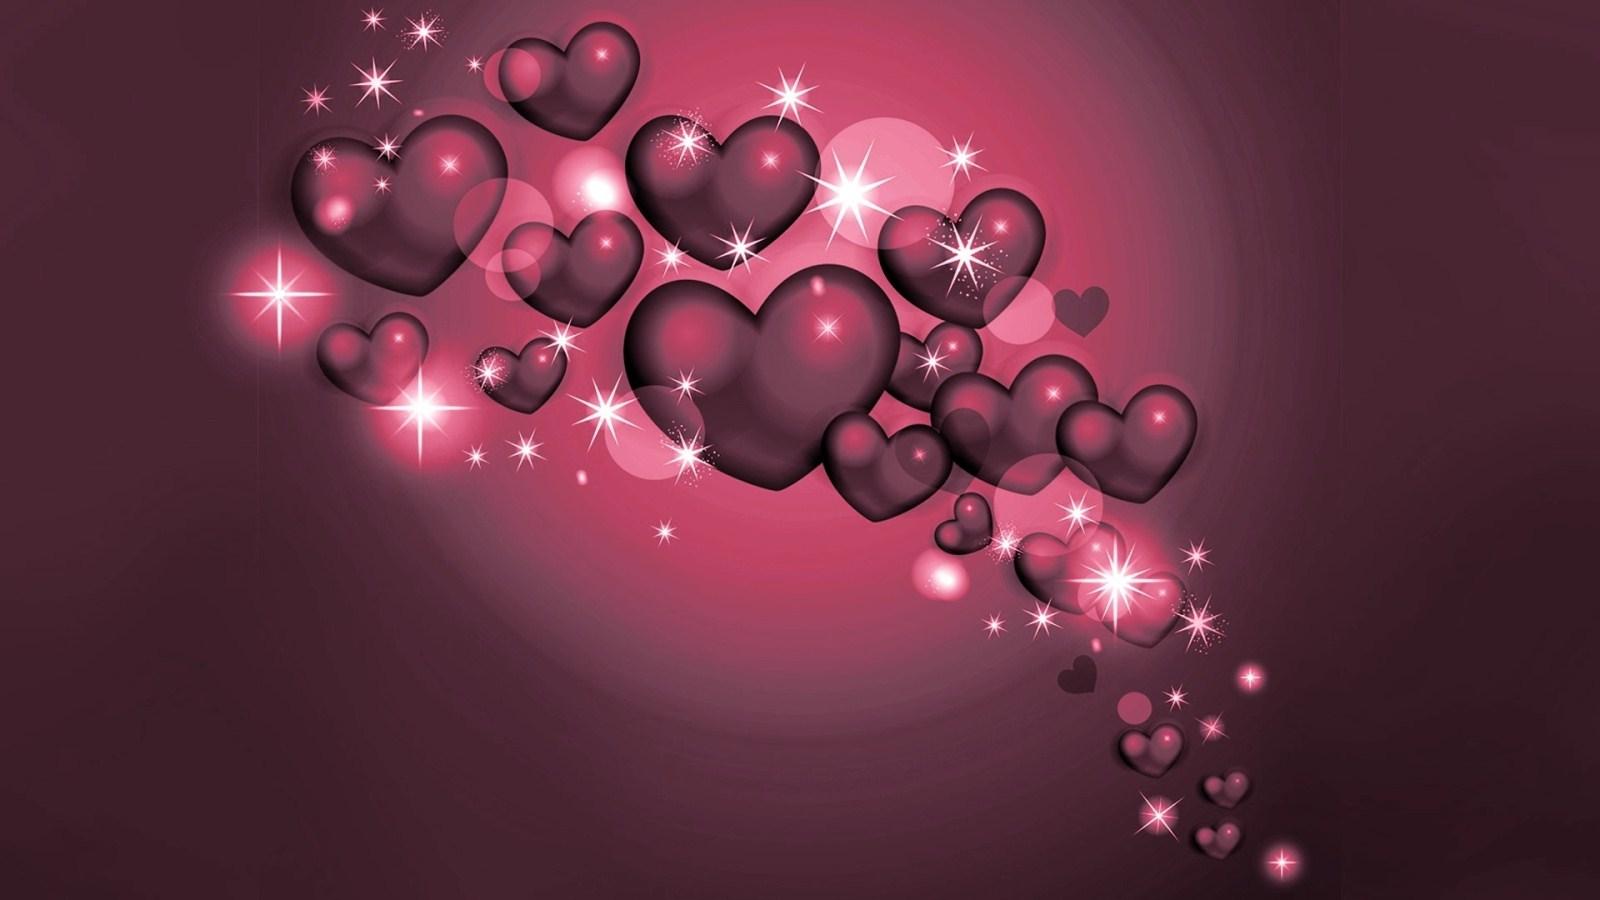 Wallpaper download hd love - Love Heart 3d Hd Wallpapers 1080p Free Download